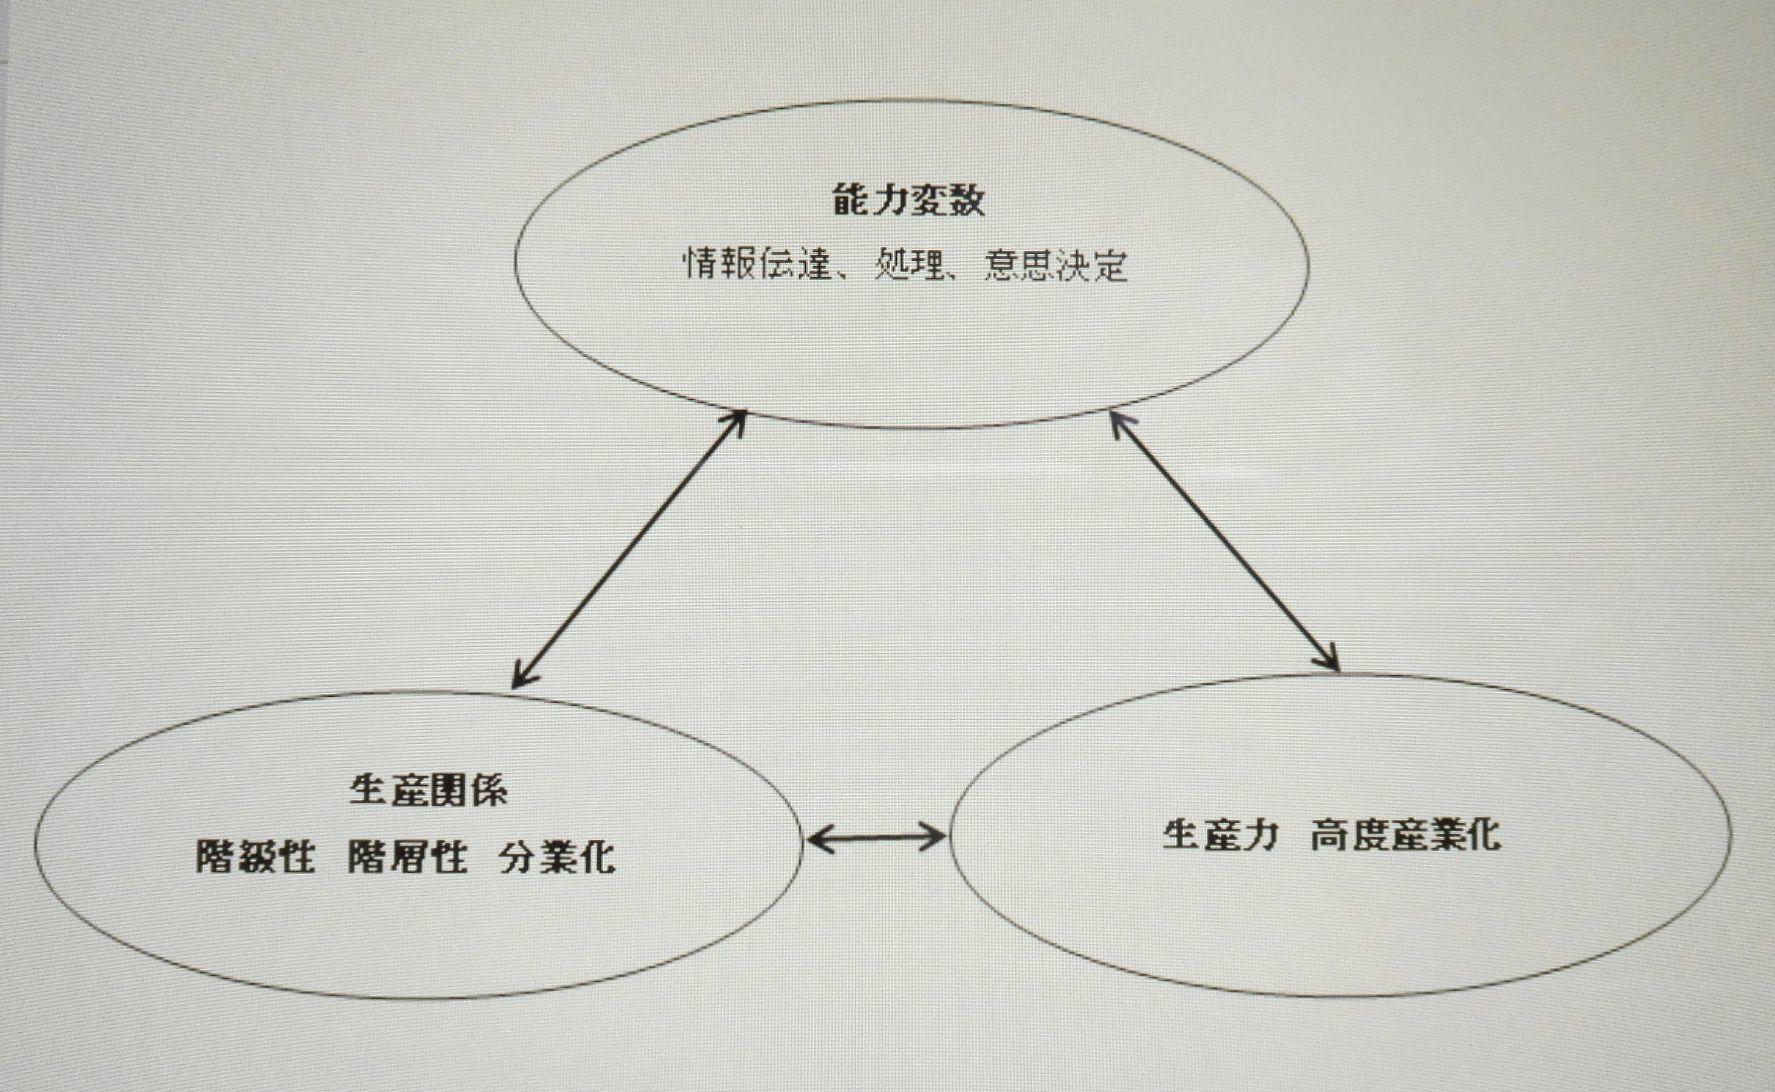 DSCN1146a.jpg